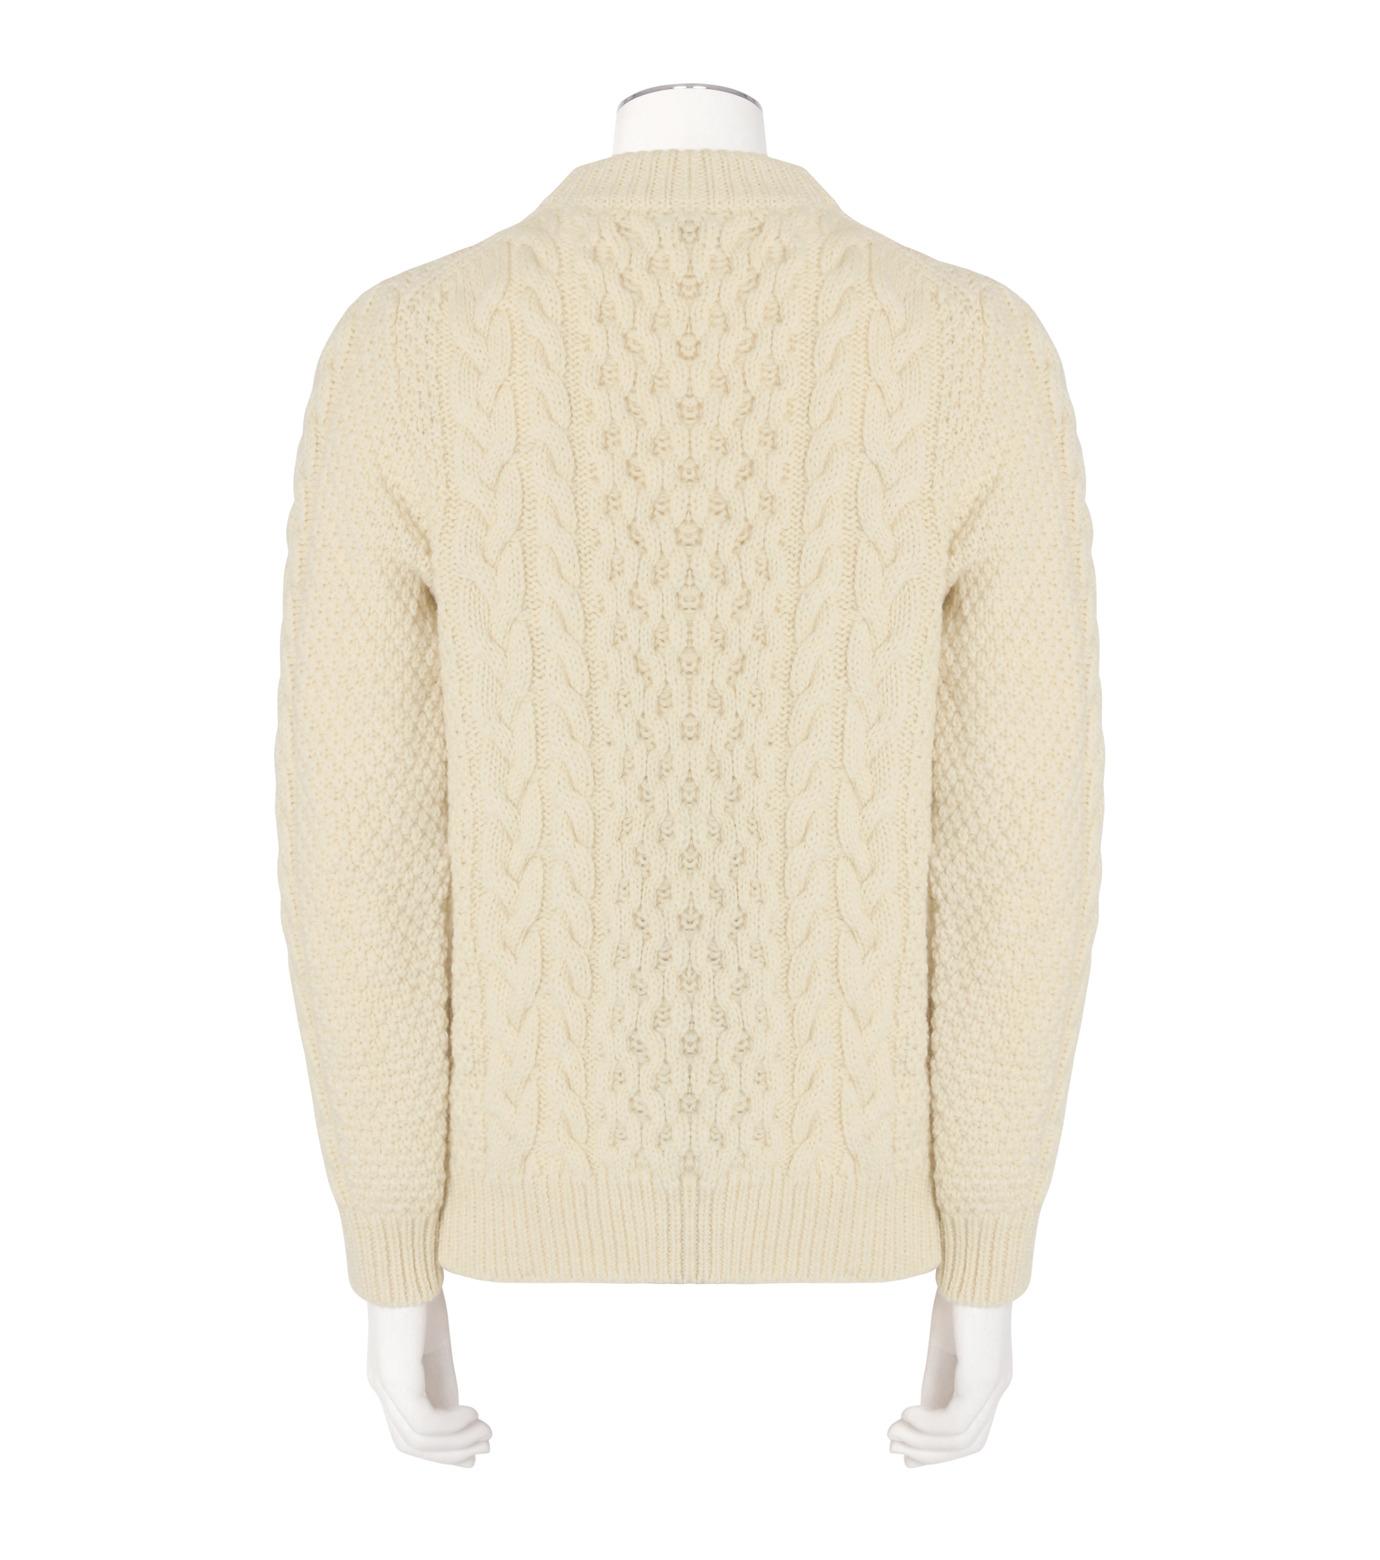 SAINT LAURENT(サンローラン)のLowgage Knit-WHITE(ニット/knit)-437265-Y1RH1-4 拡大詳細画像2